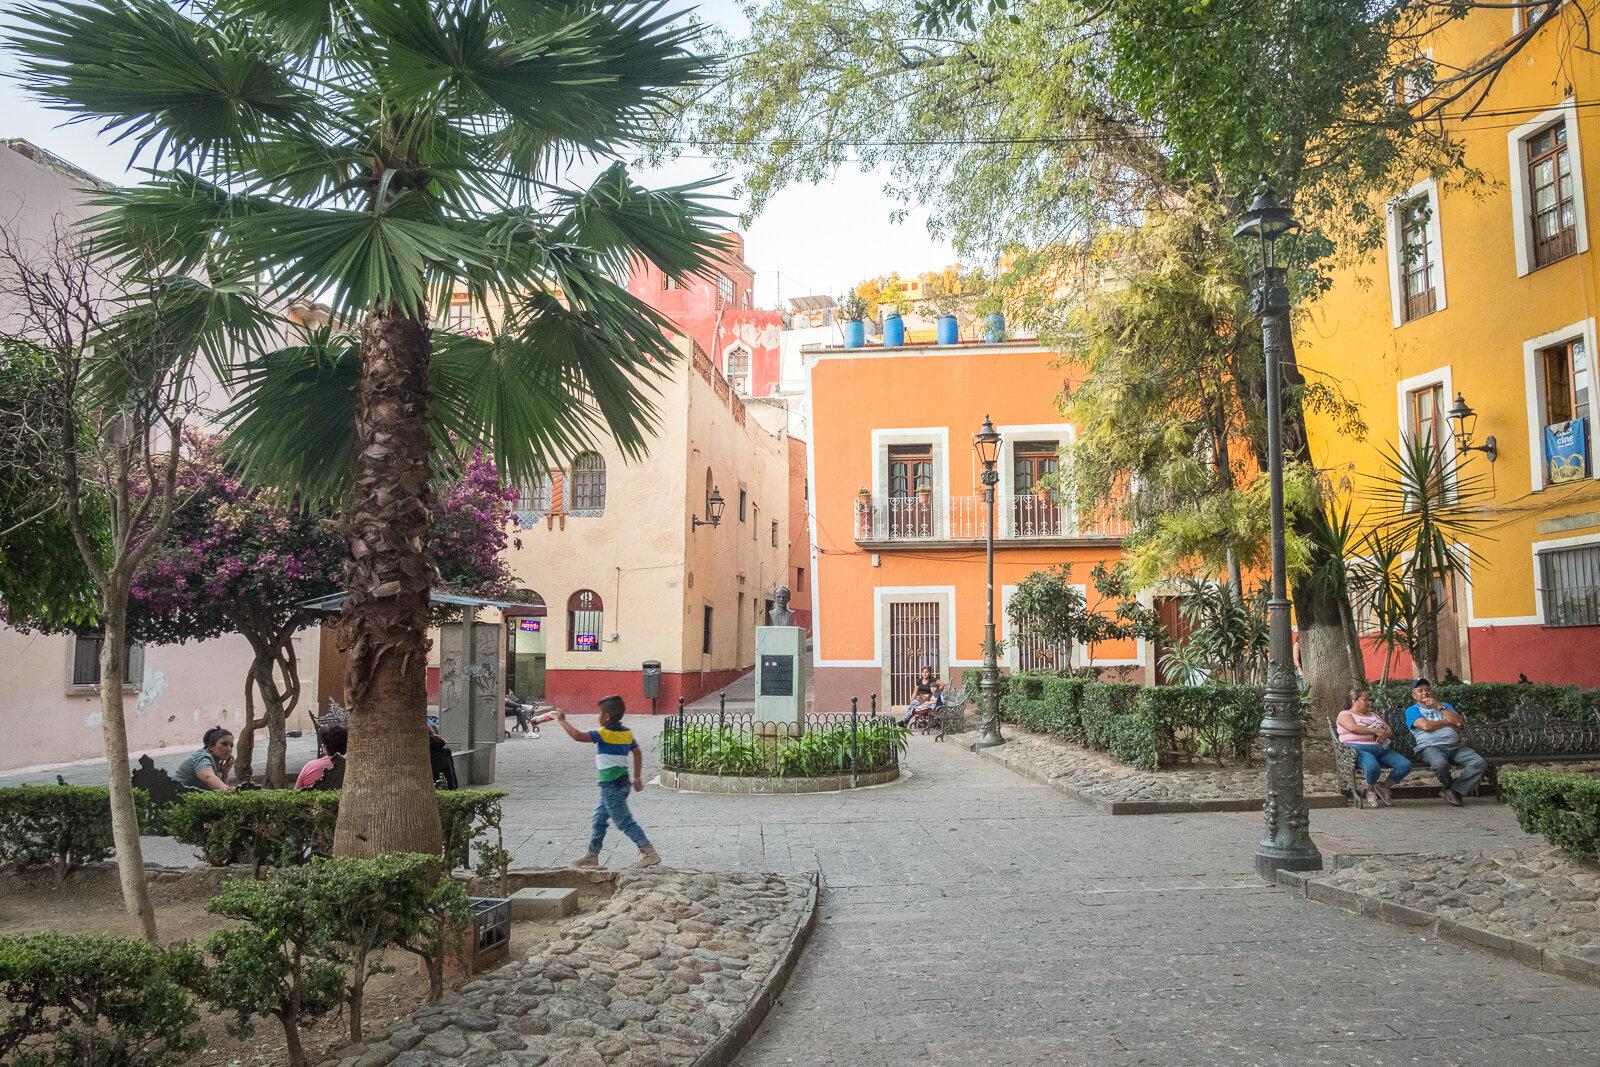 2019.10.8_Mexico_Guanajuato16_Britt first year.jpg